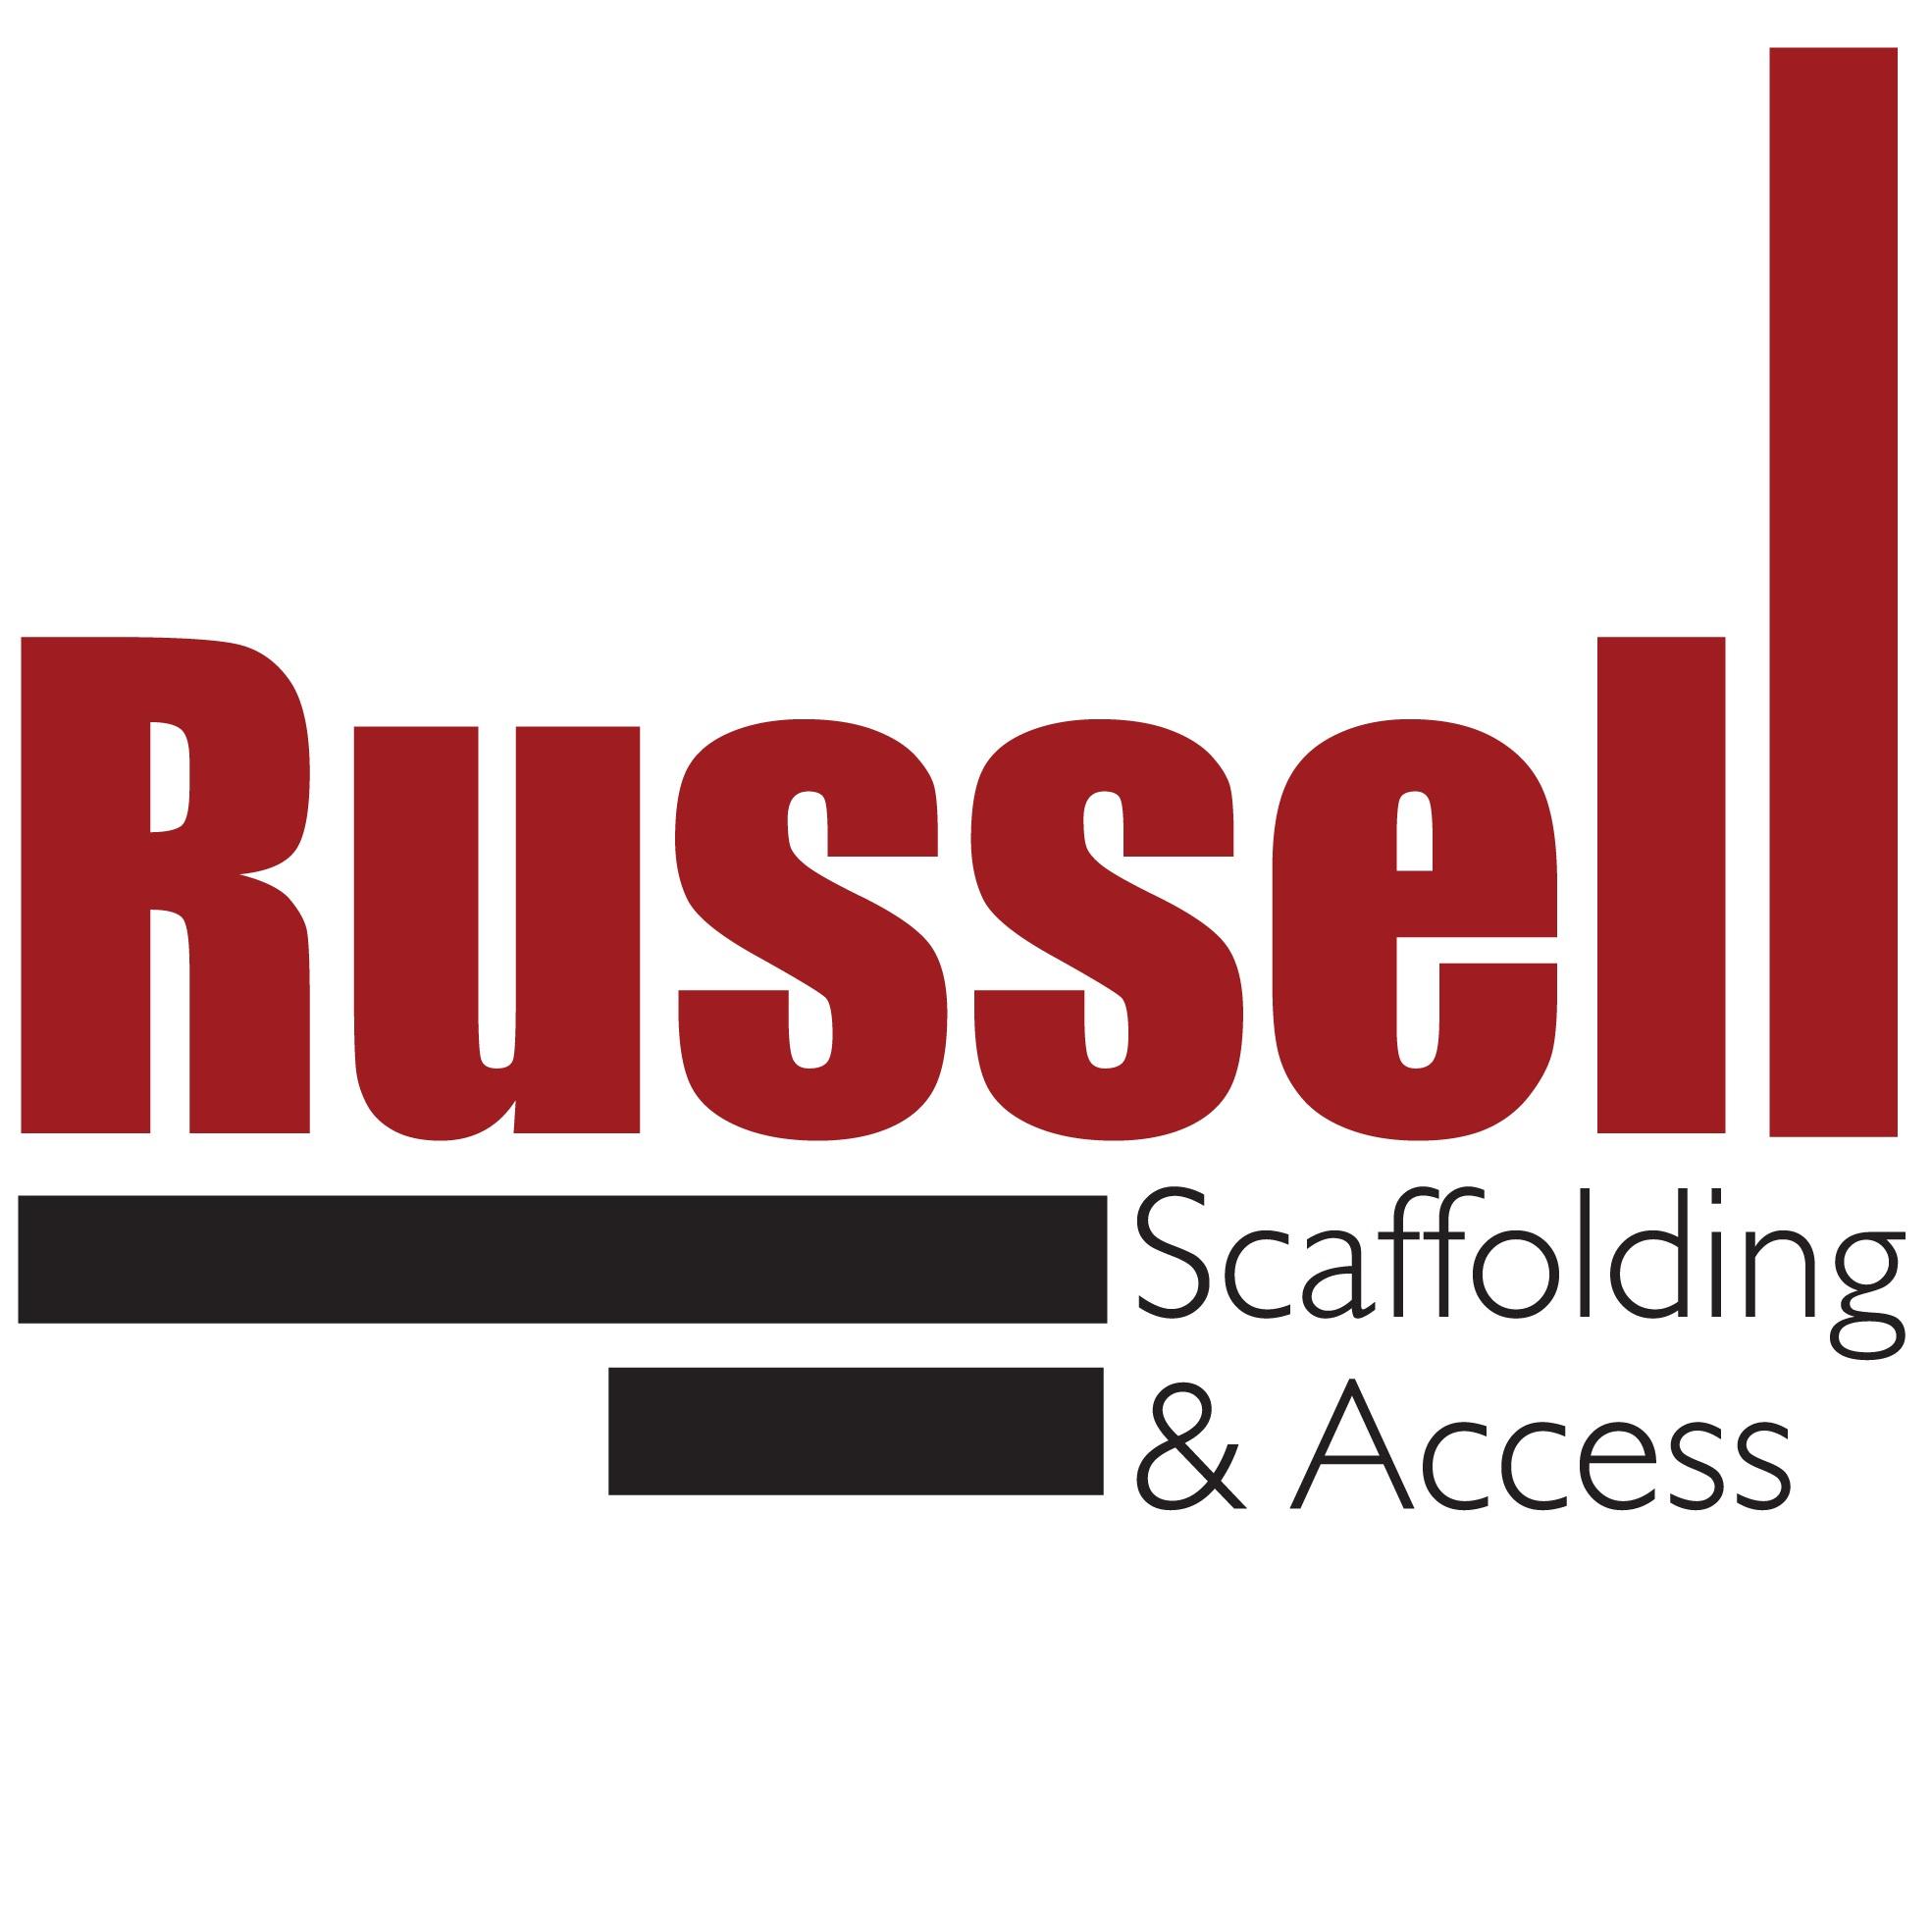 Russell Scaffolding